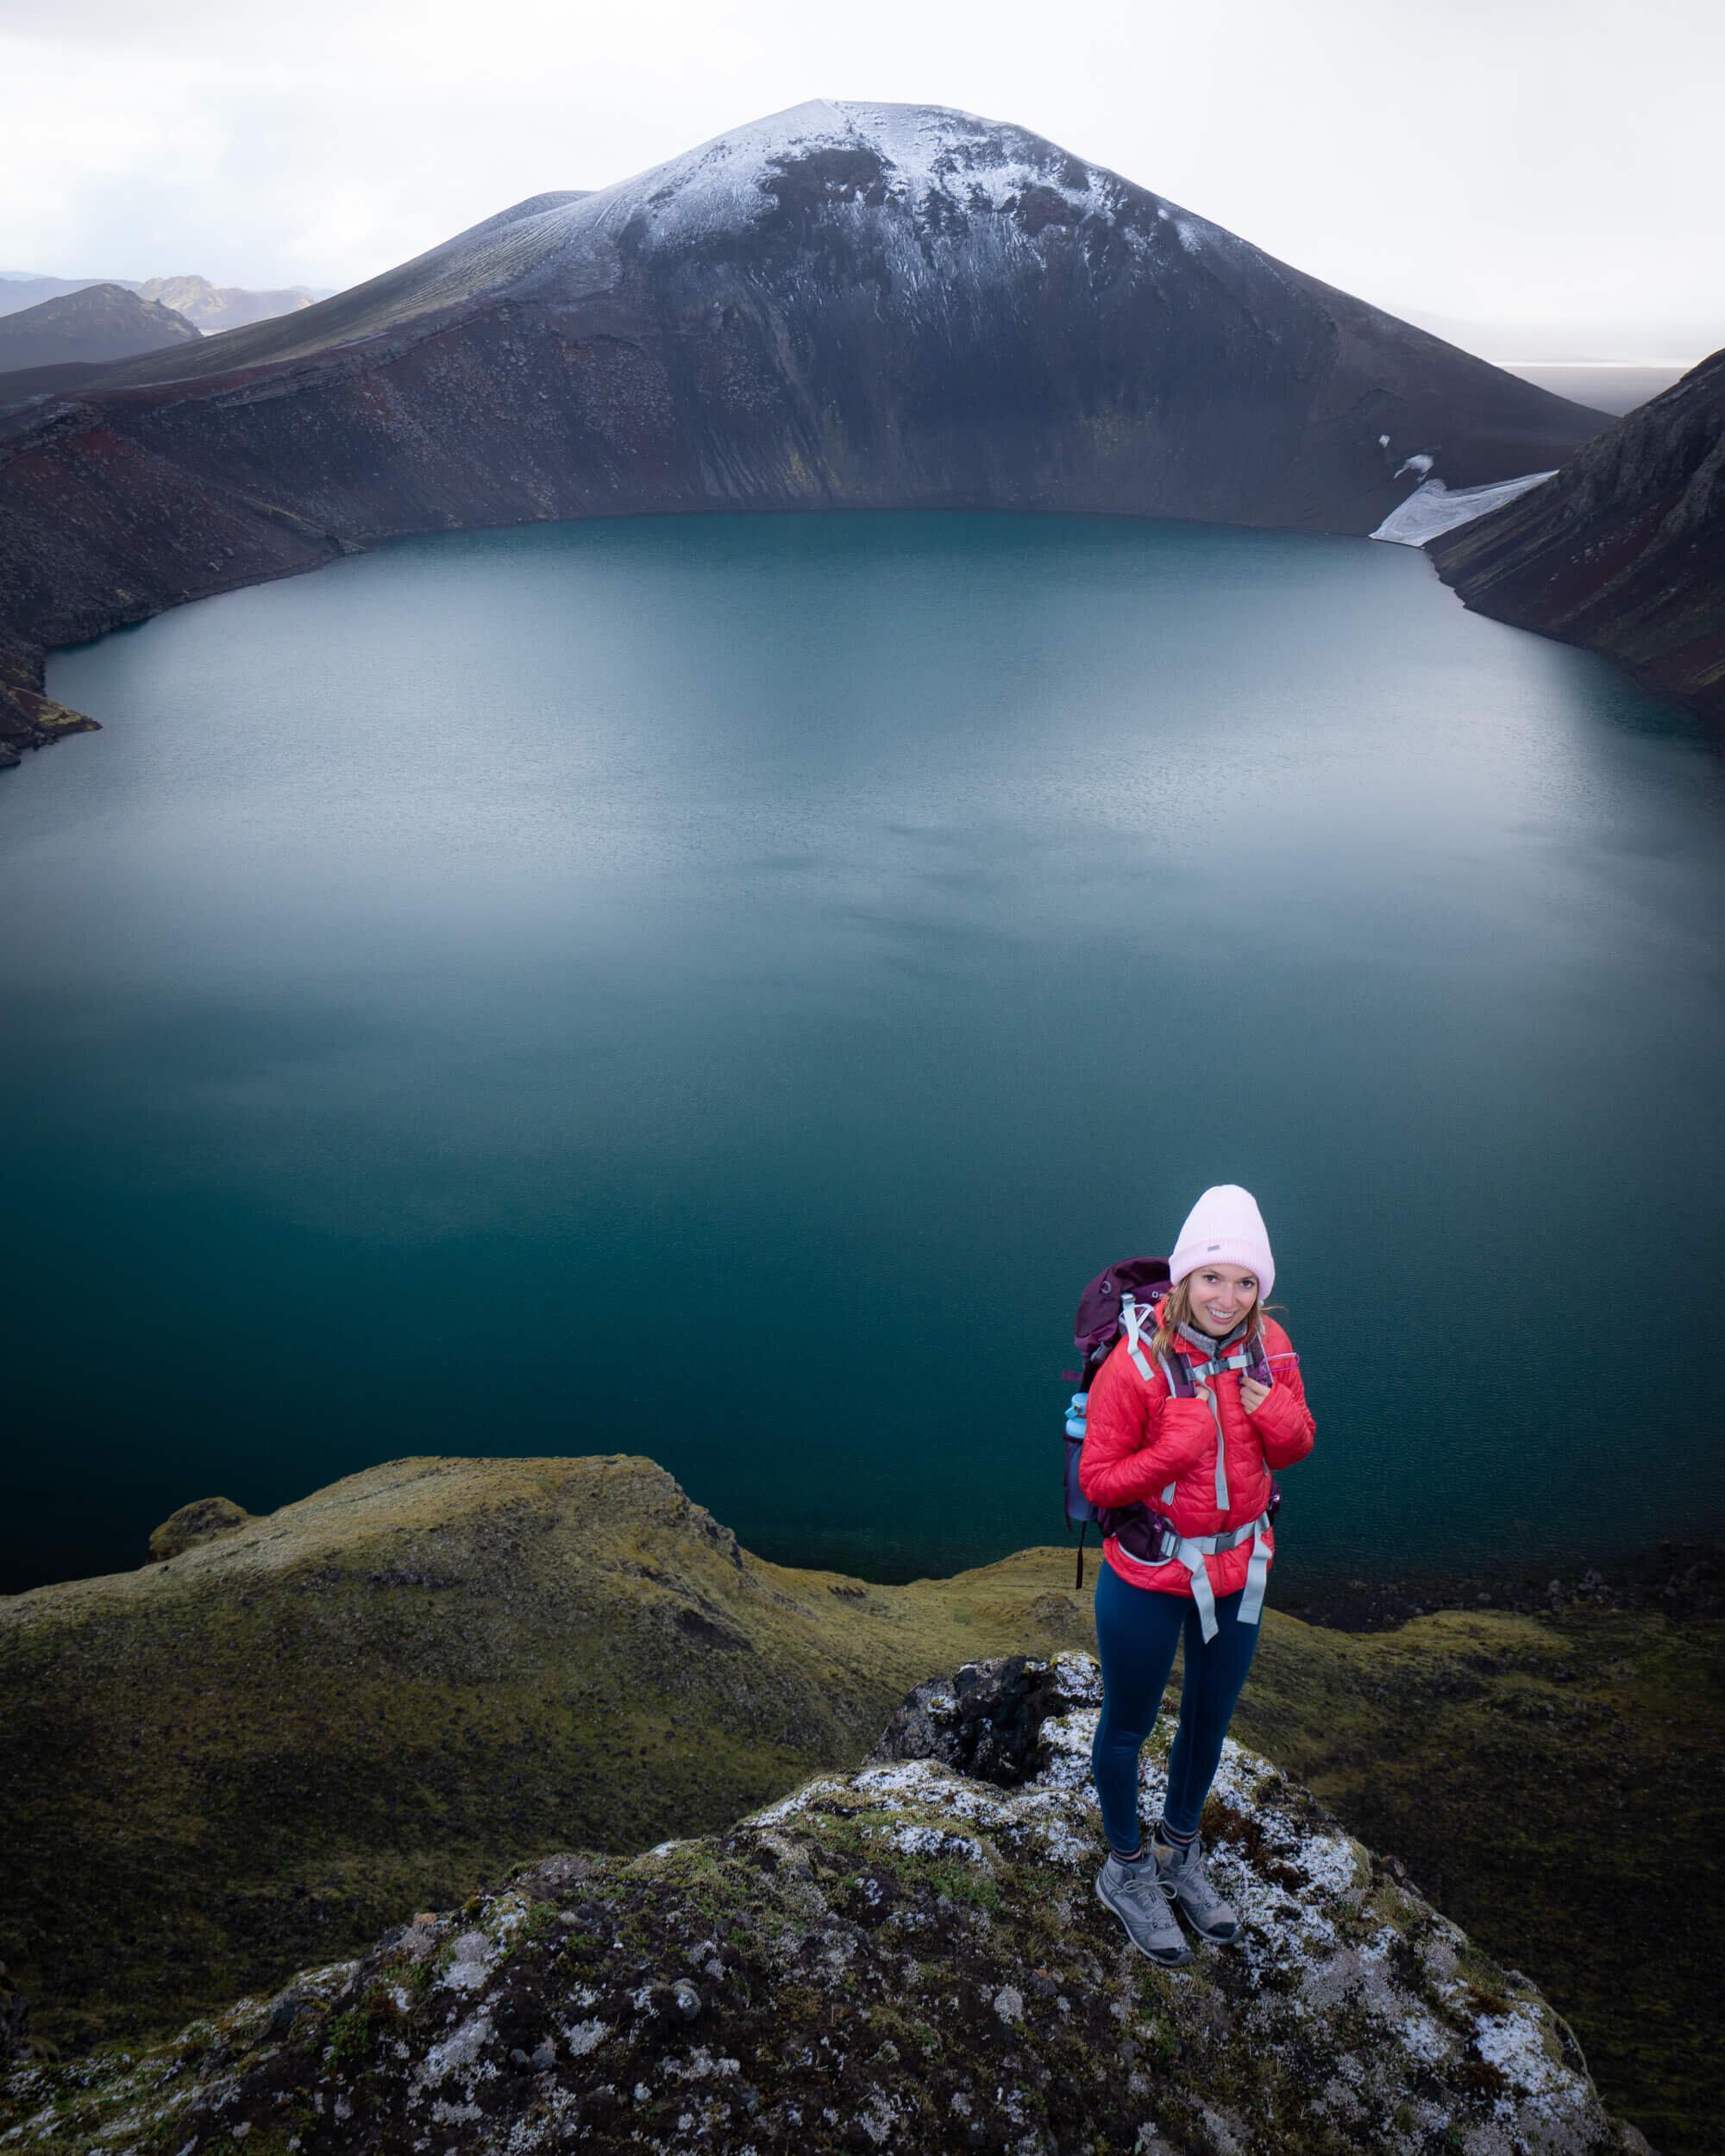 Hnausapollur Crater, Iceland